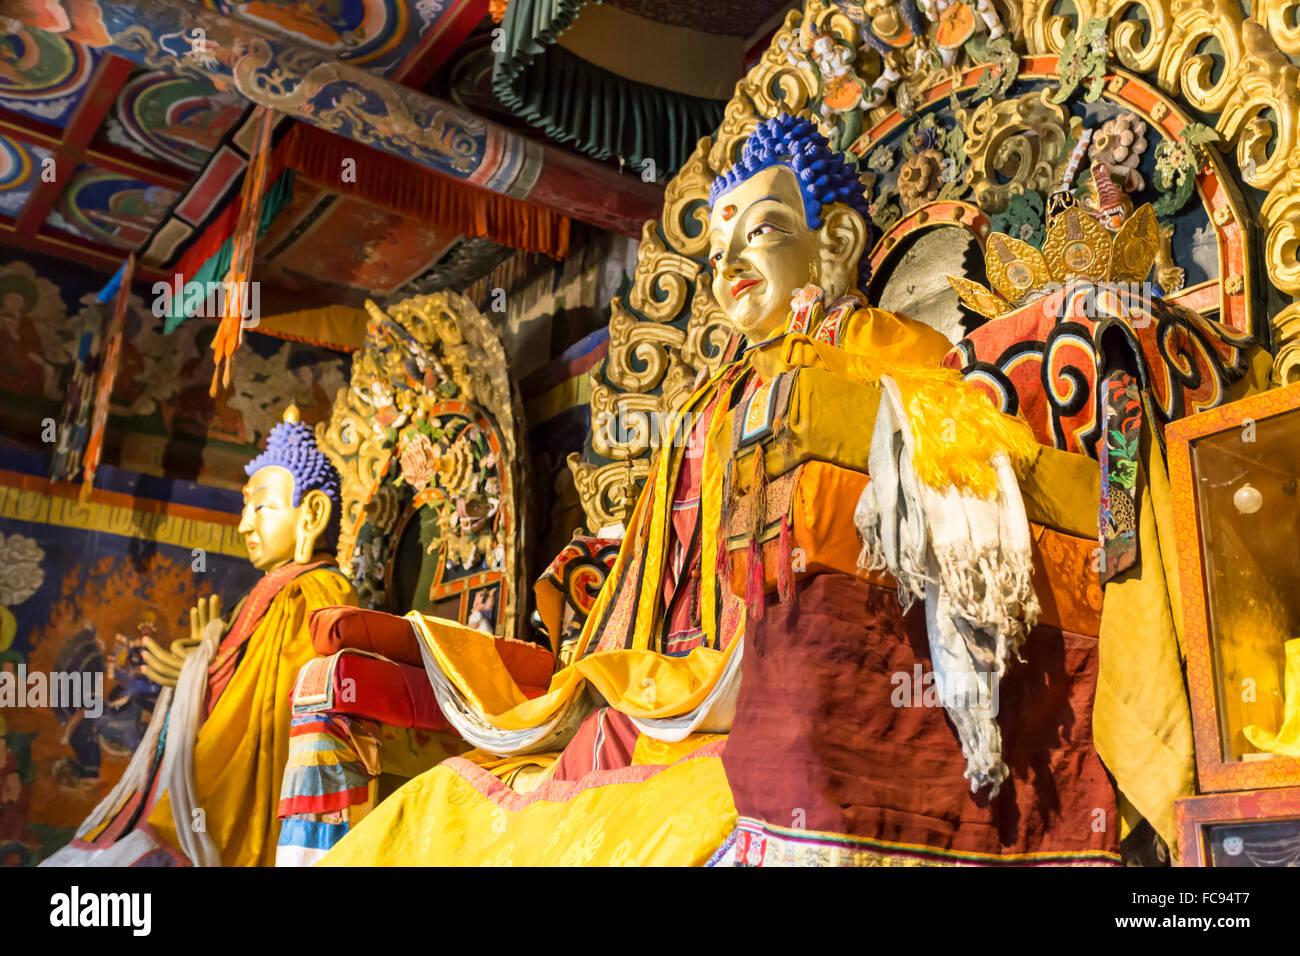 Golden Buddha statues, Baruun Zuu temple, Erdene Zuu Khiid, Monastery, Kharkhorin (Karakorum), Central Mongolia, - Stock Image